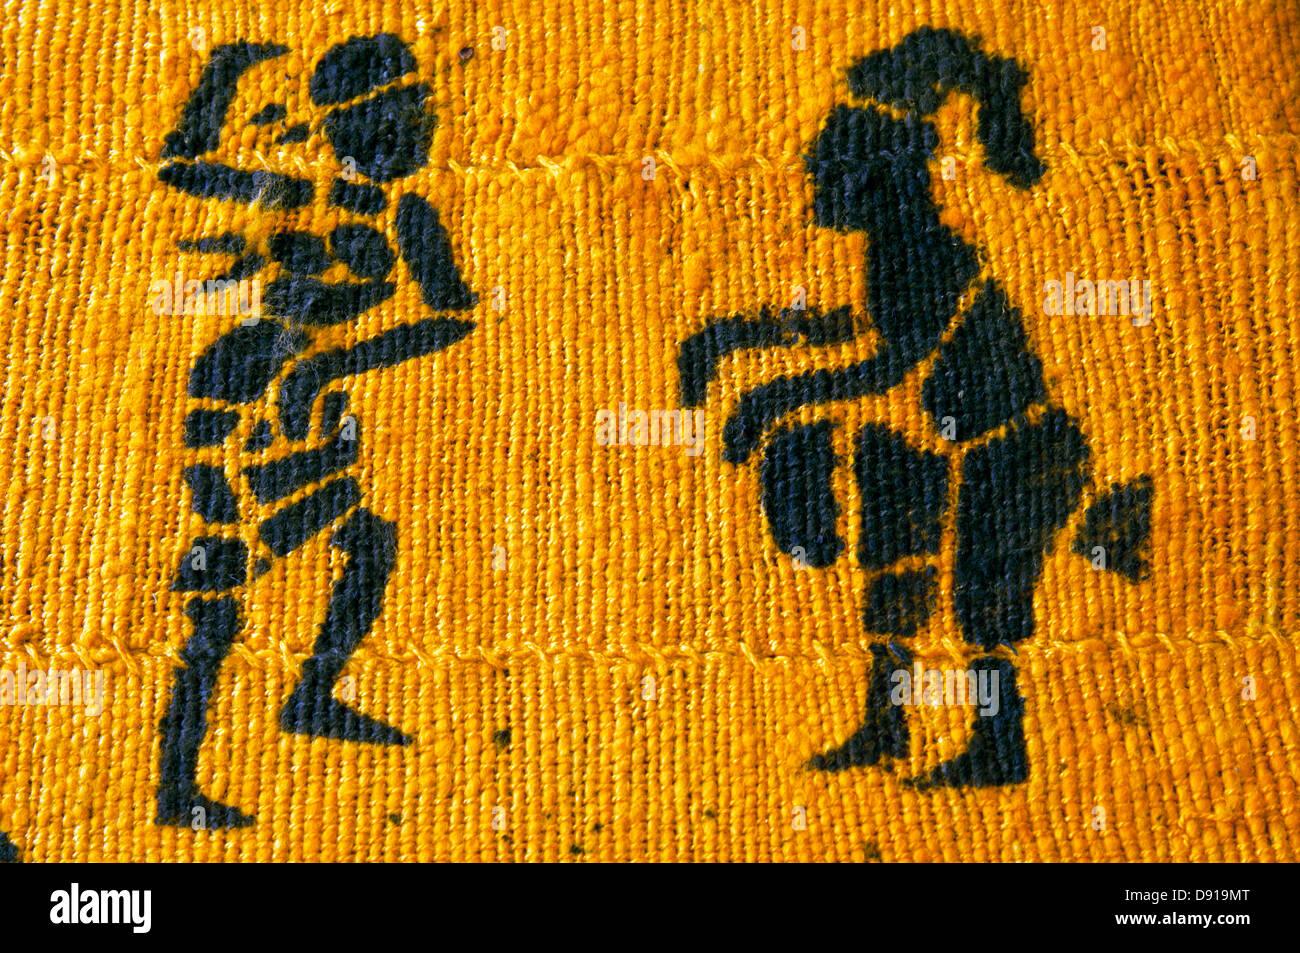 hand-woven textile, ghana, in studio setting - Stock Image